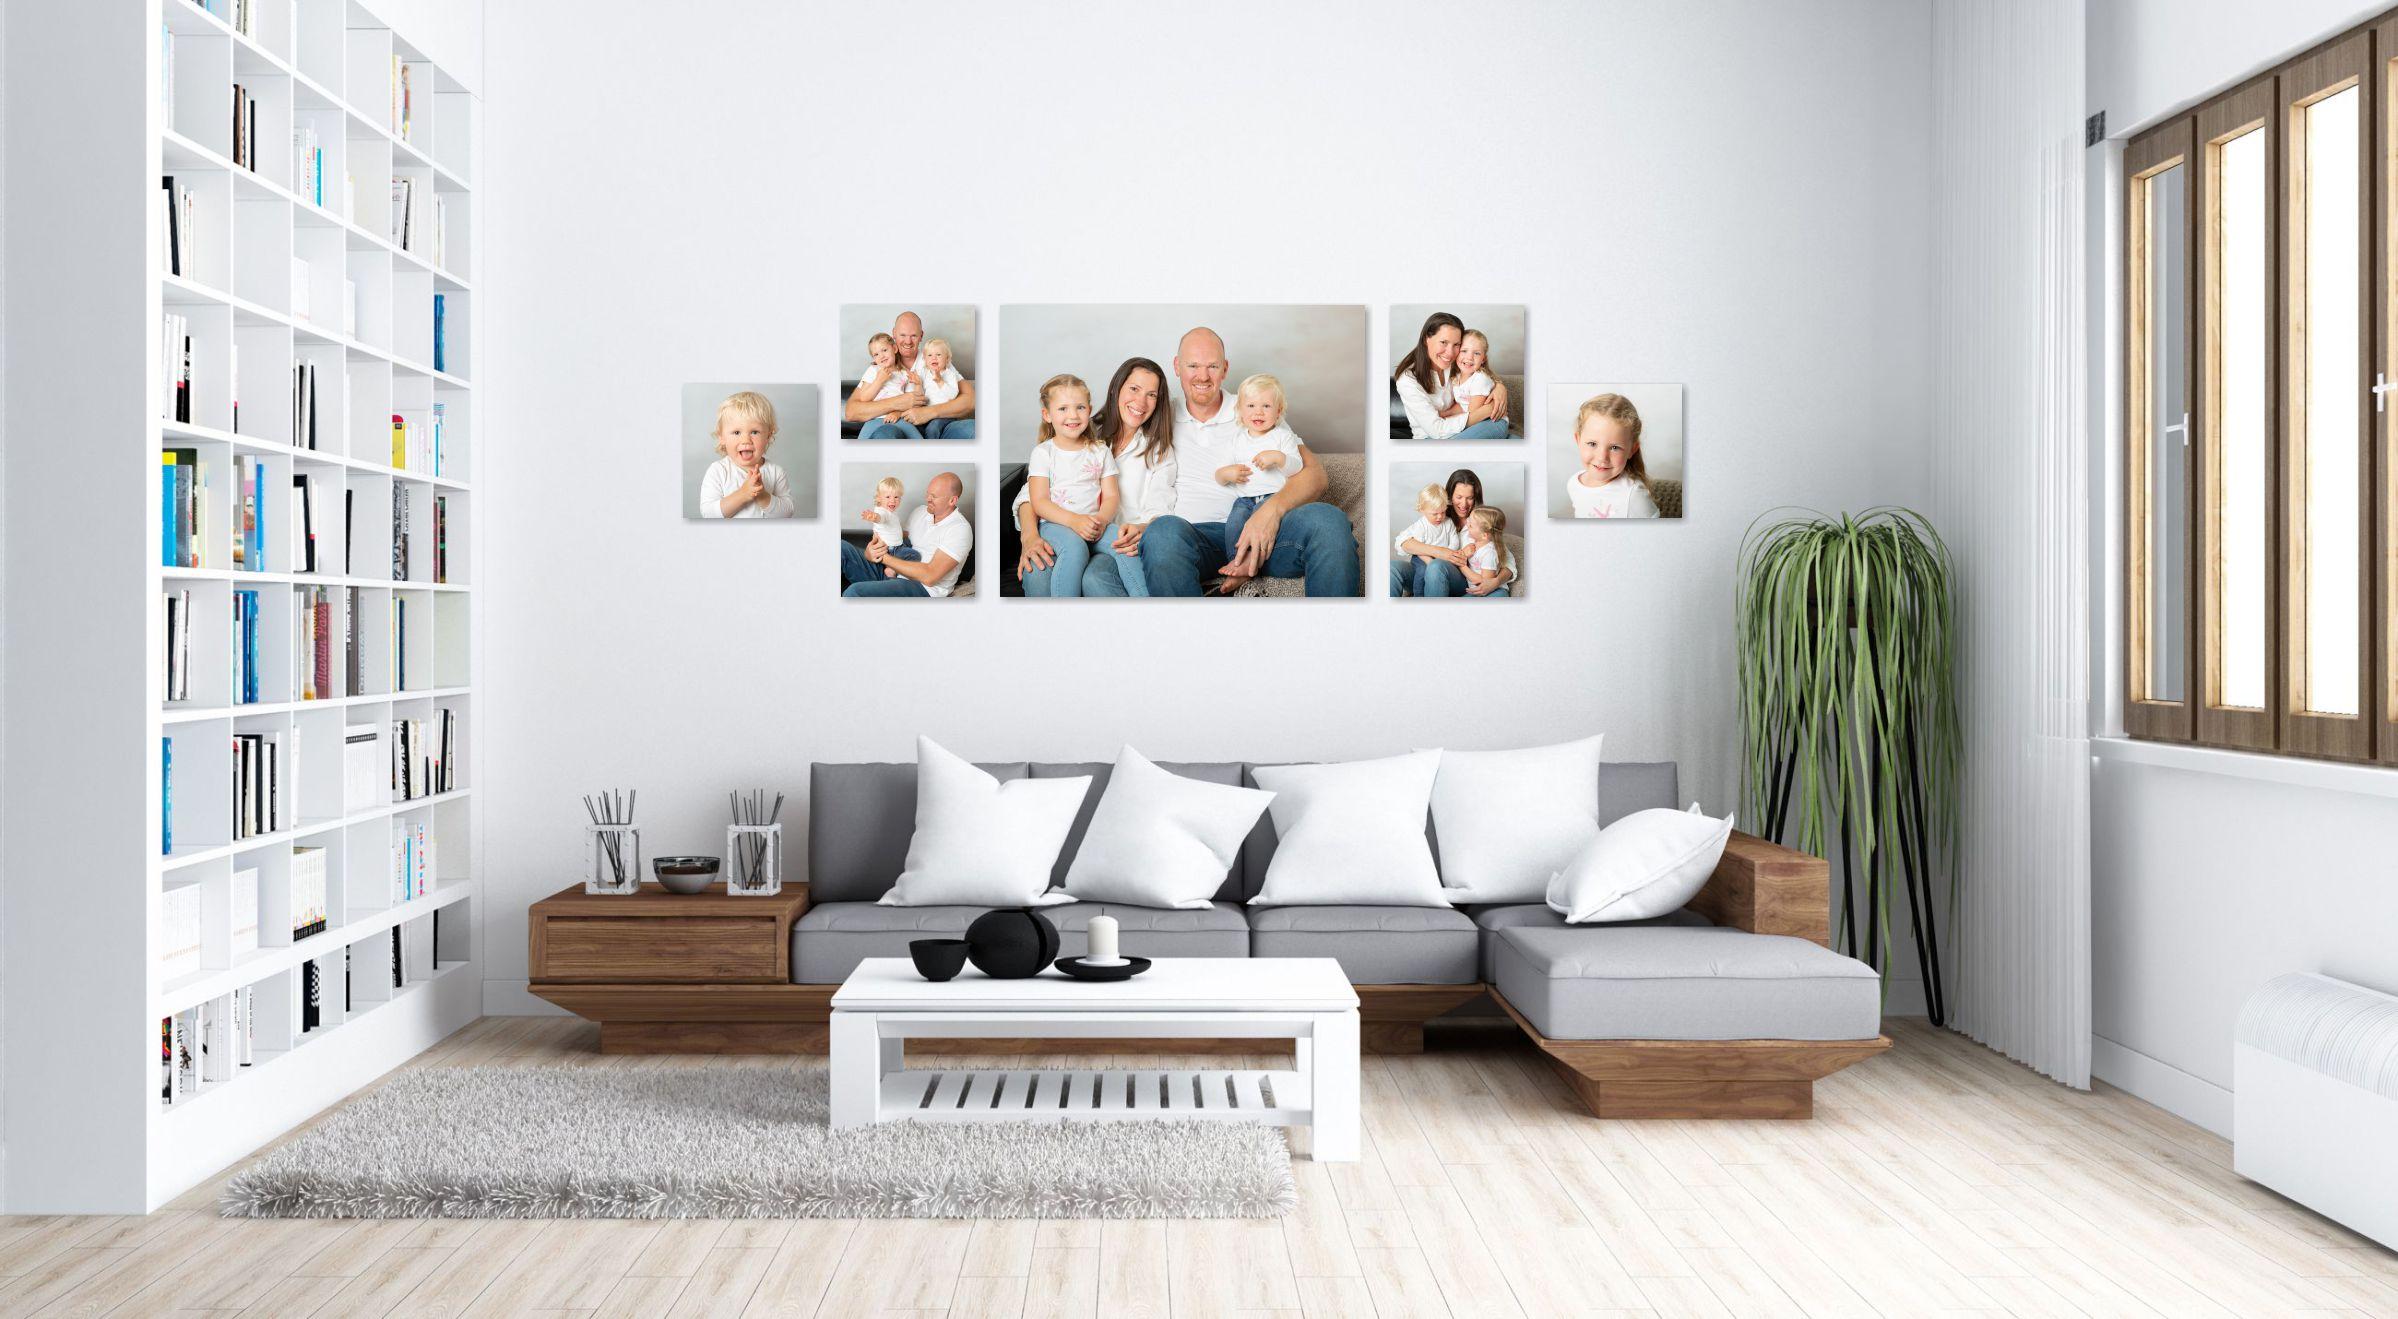 Family Photography Wall Portraits.jpg